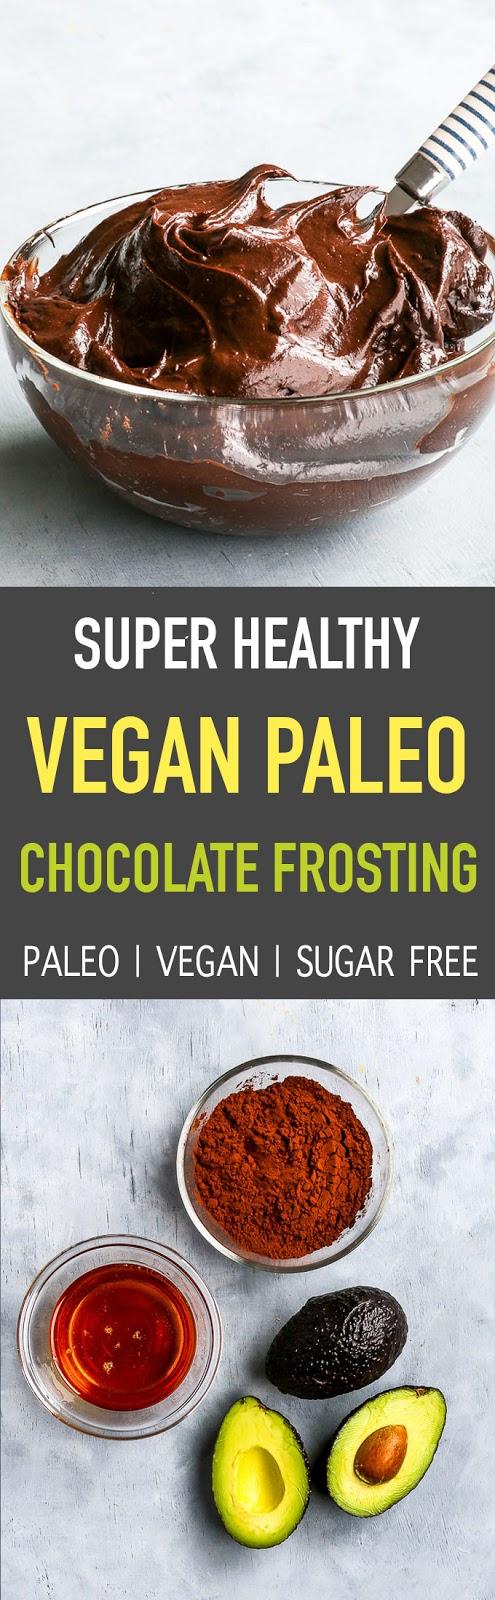 Super Healthy 3-Ingredient Paleo + Vegan Chocolate Frosting